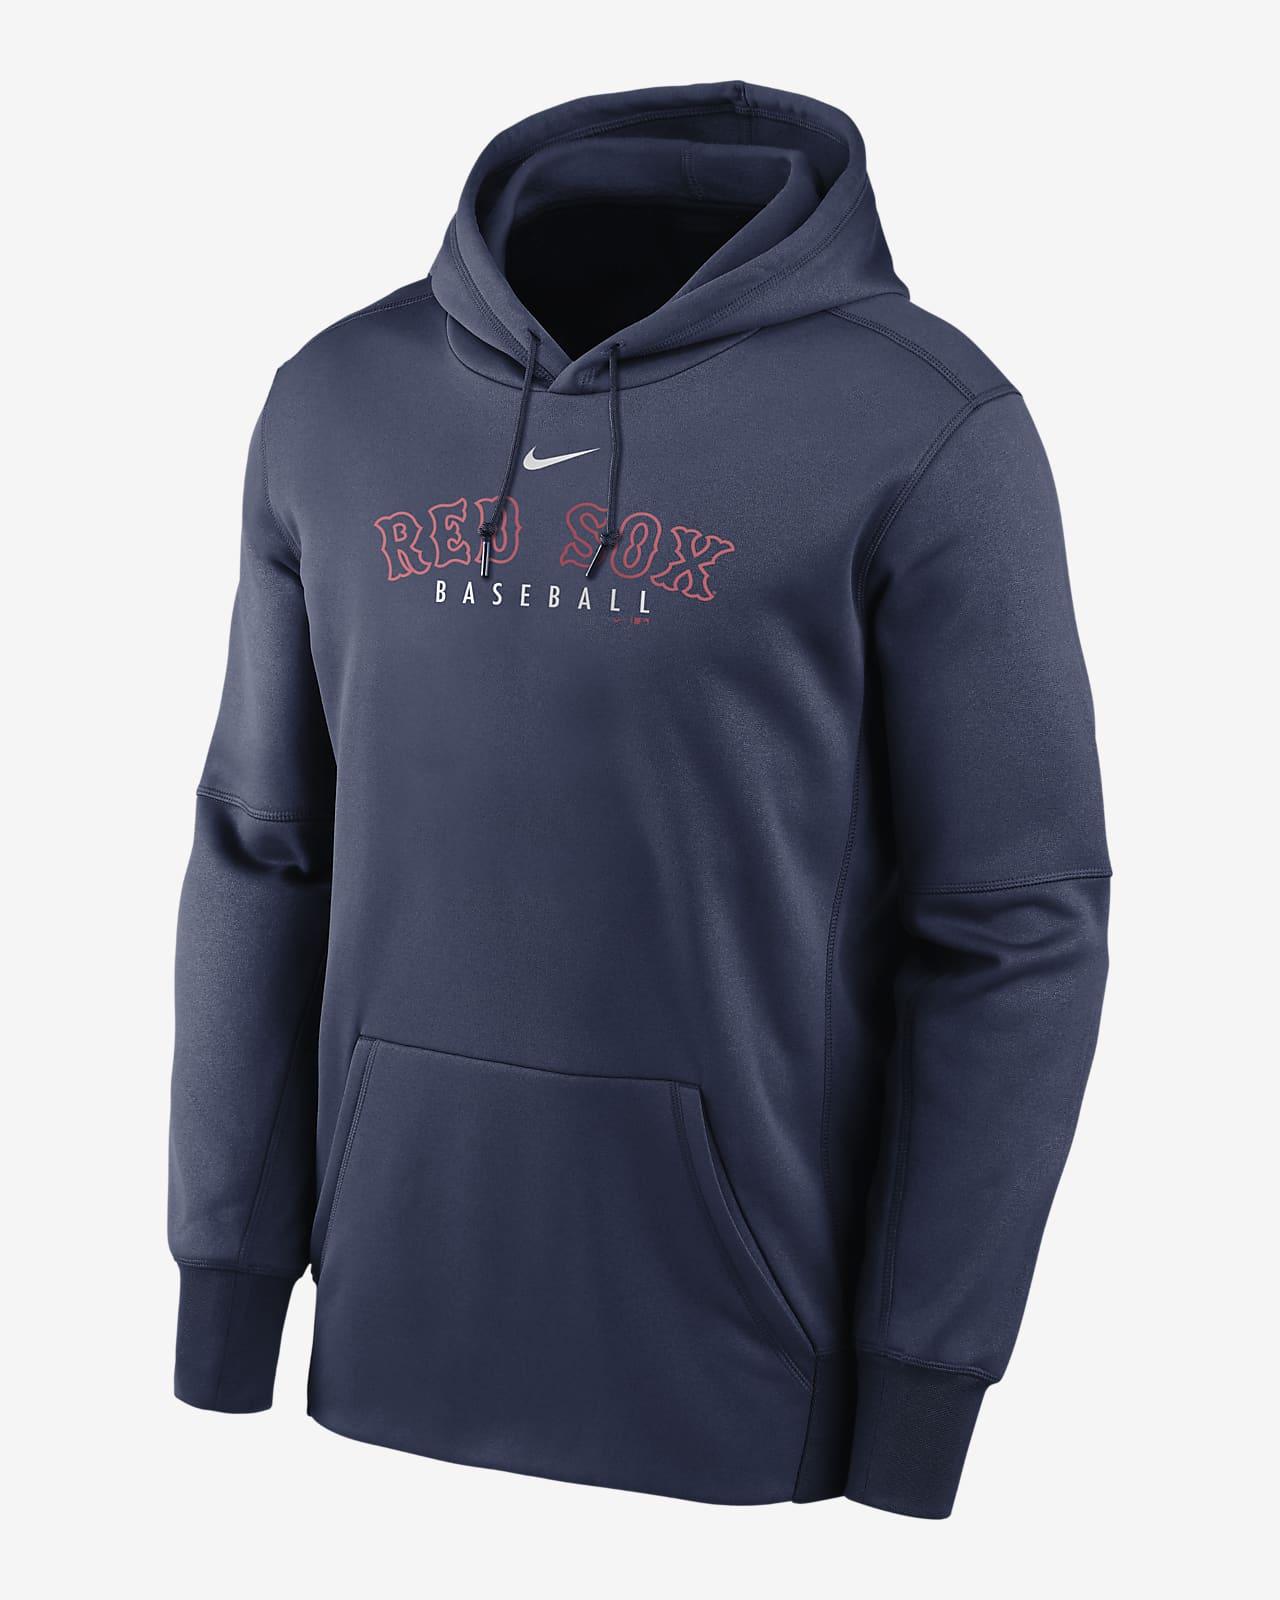 Nike Therma Outline Wordmark (MLB Boston Red Sox) Men's Pullover Hoodie